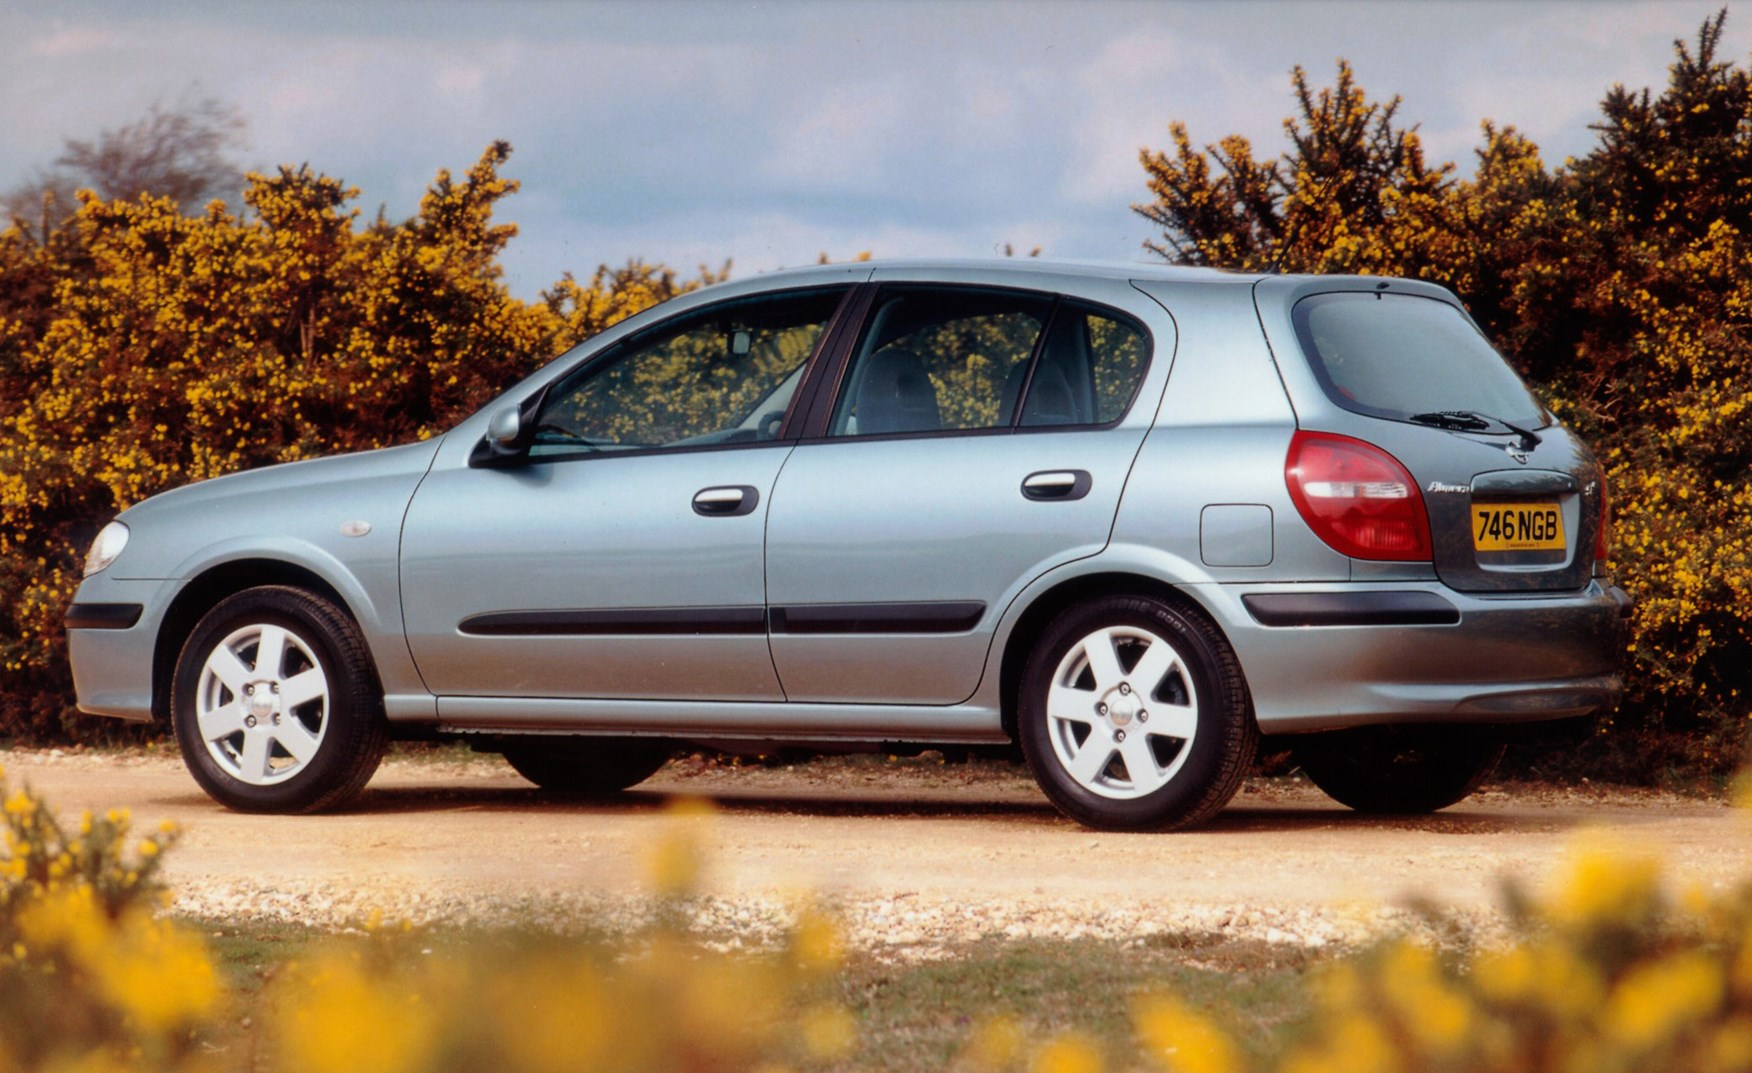 Nissan Almera Hatchback Review (2000 - 2006) | Parkers